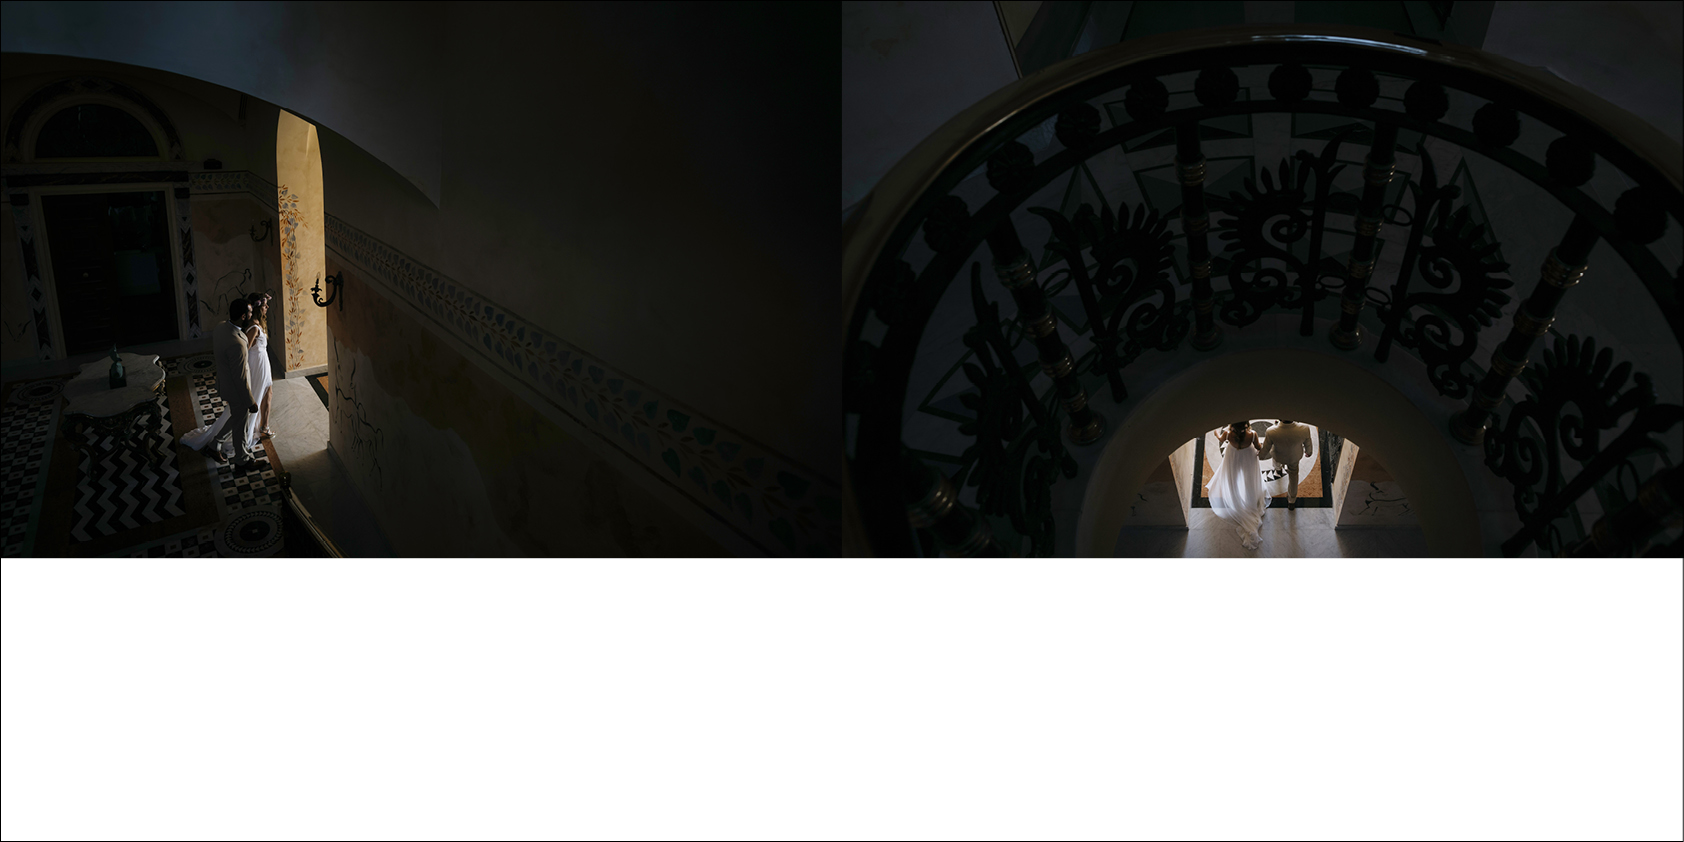 ERIC_RONALD_12X12_OMAR_SUSI_021.jpg